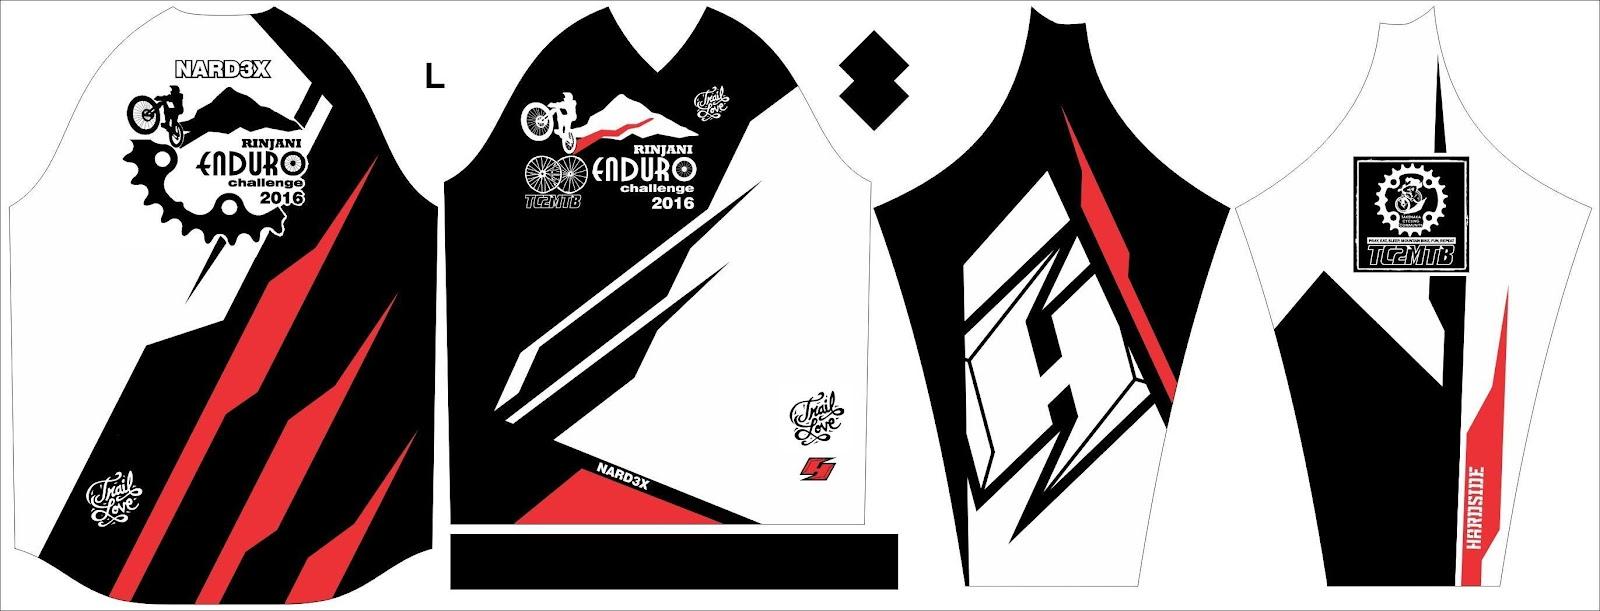 Nardex Mtb Fashion Di Olahraga Sepeda Baju Specialized Jersey Template Rinjani Enduro Challenge 2016 By Pattern Hardside Logo Rec Team